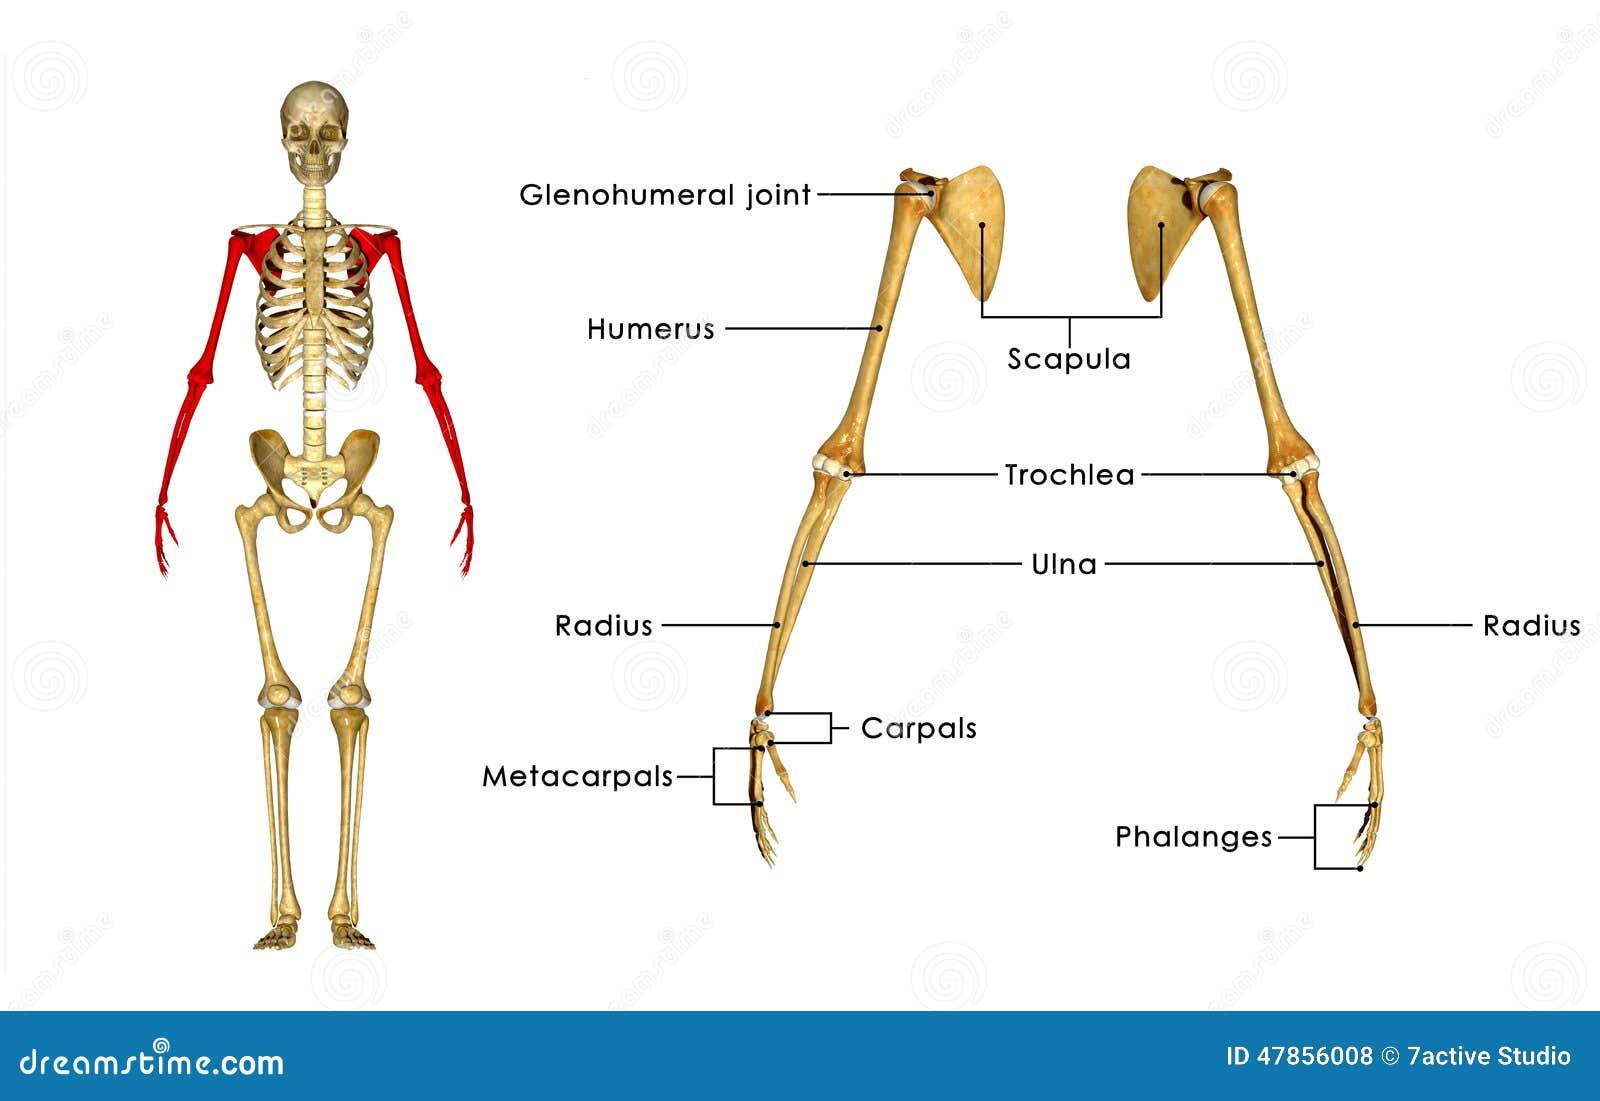 Skeleton hand bones